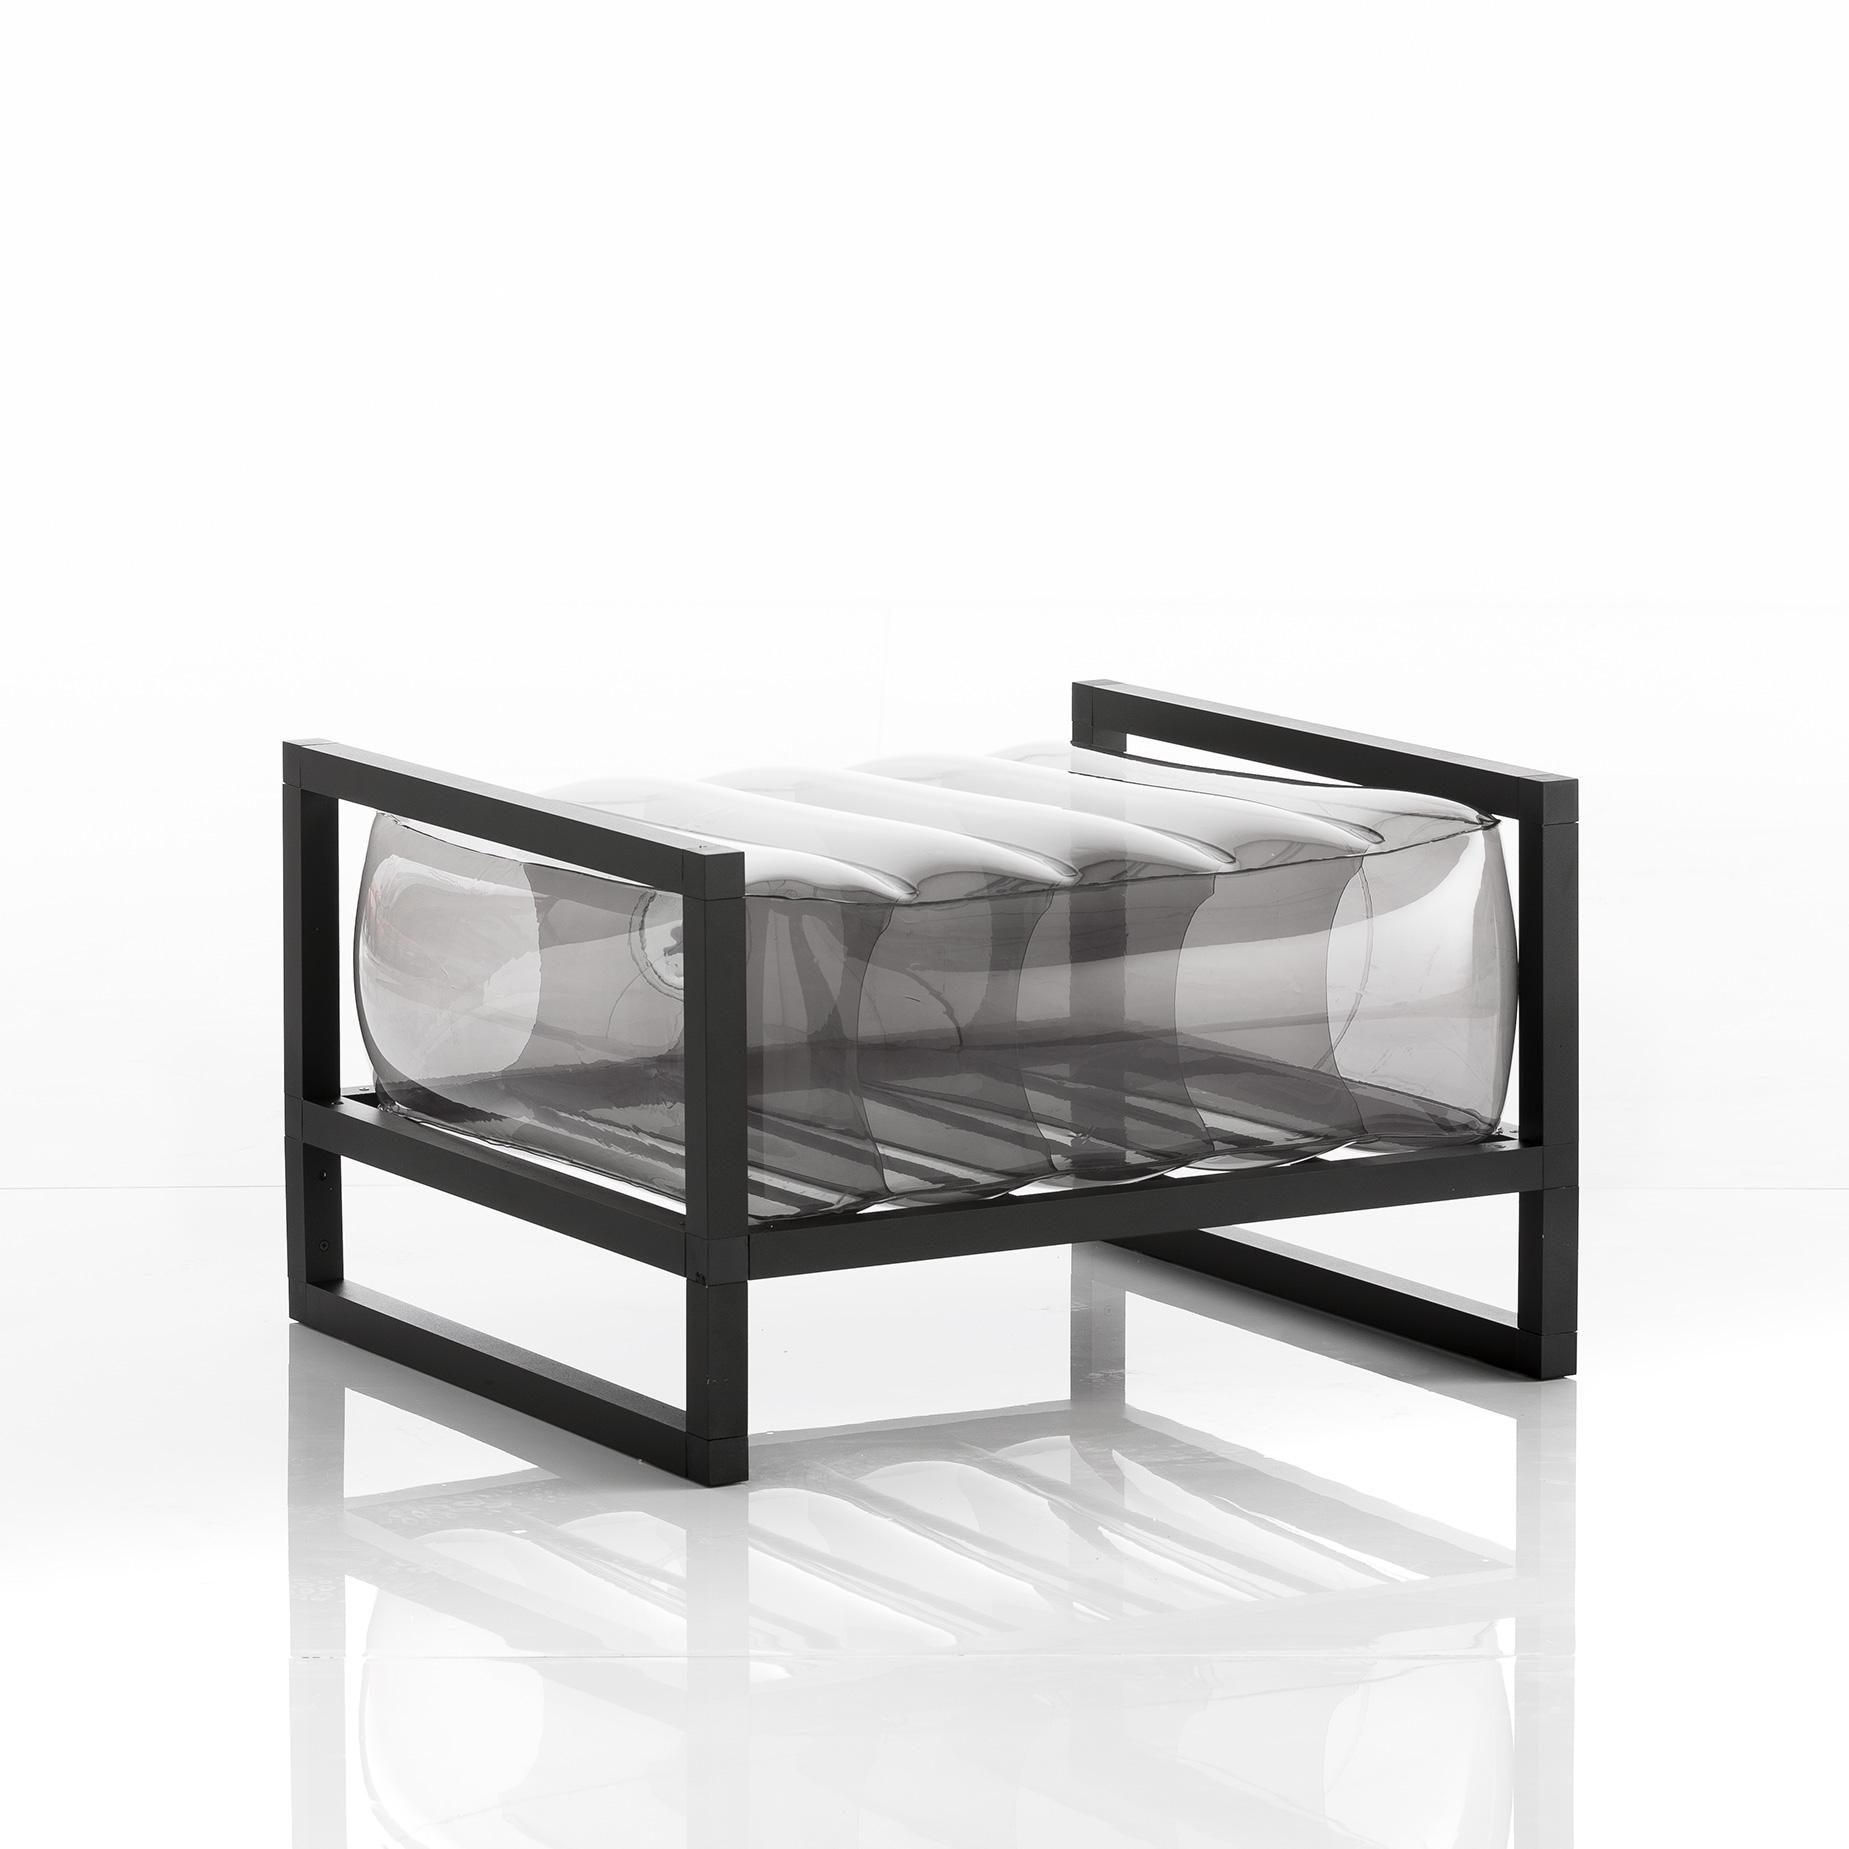 Pouf tpu noir cadre en aluminium